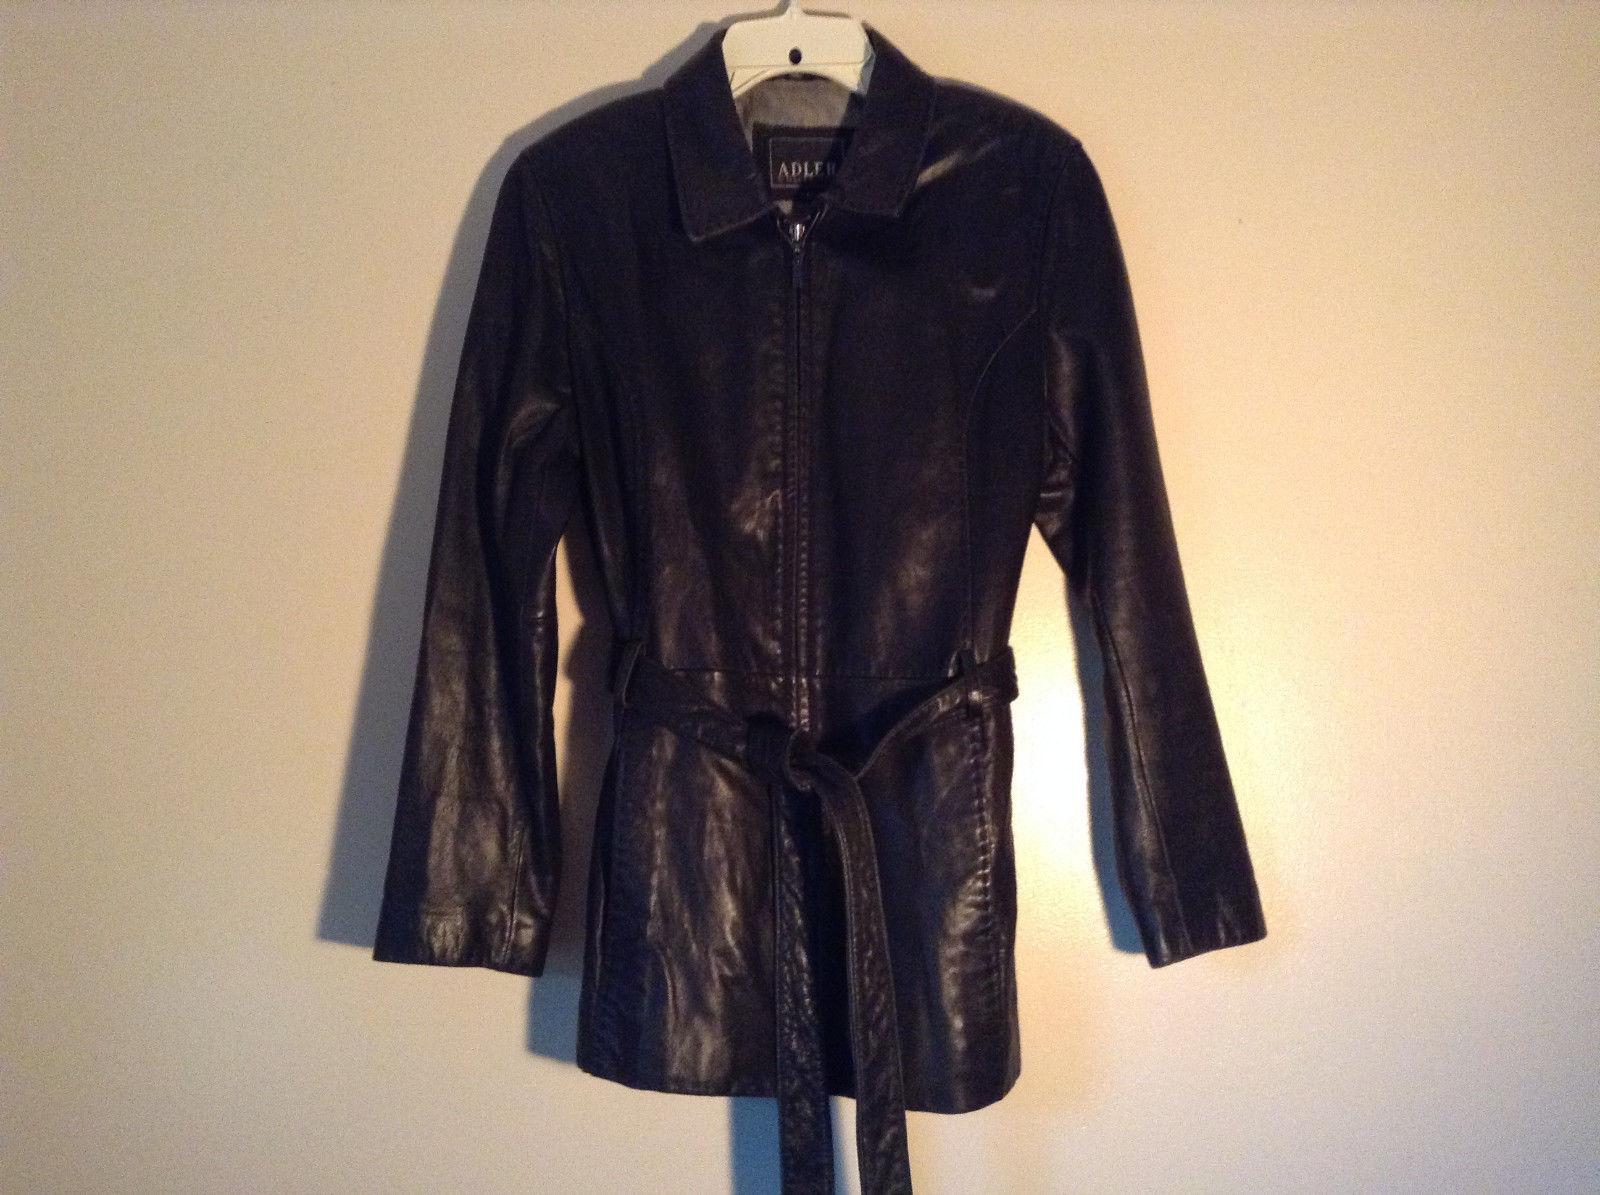 Black Leather Jacket by Adler Collection Zip Up with Belt Shoulder Pads Size L